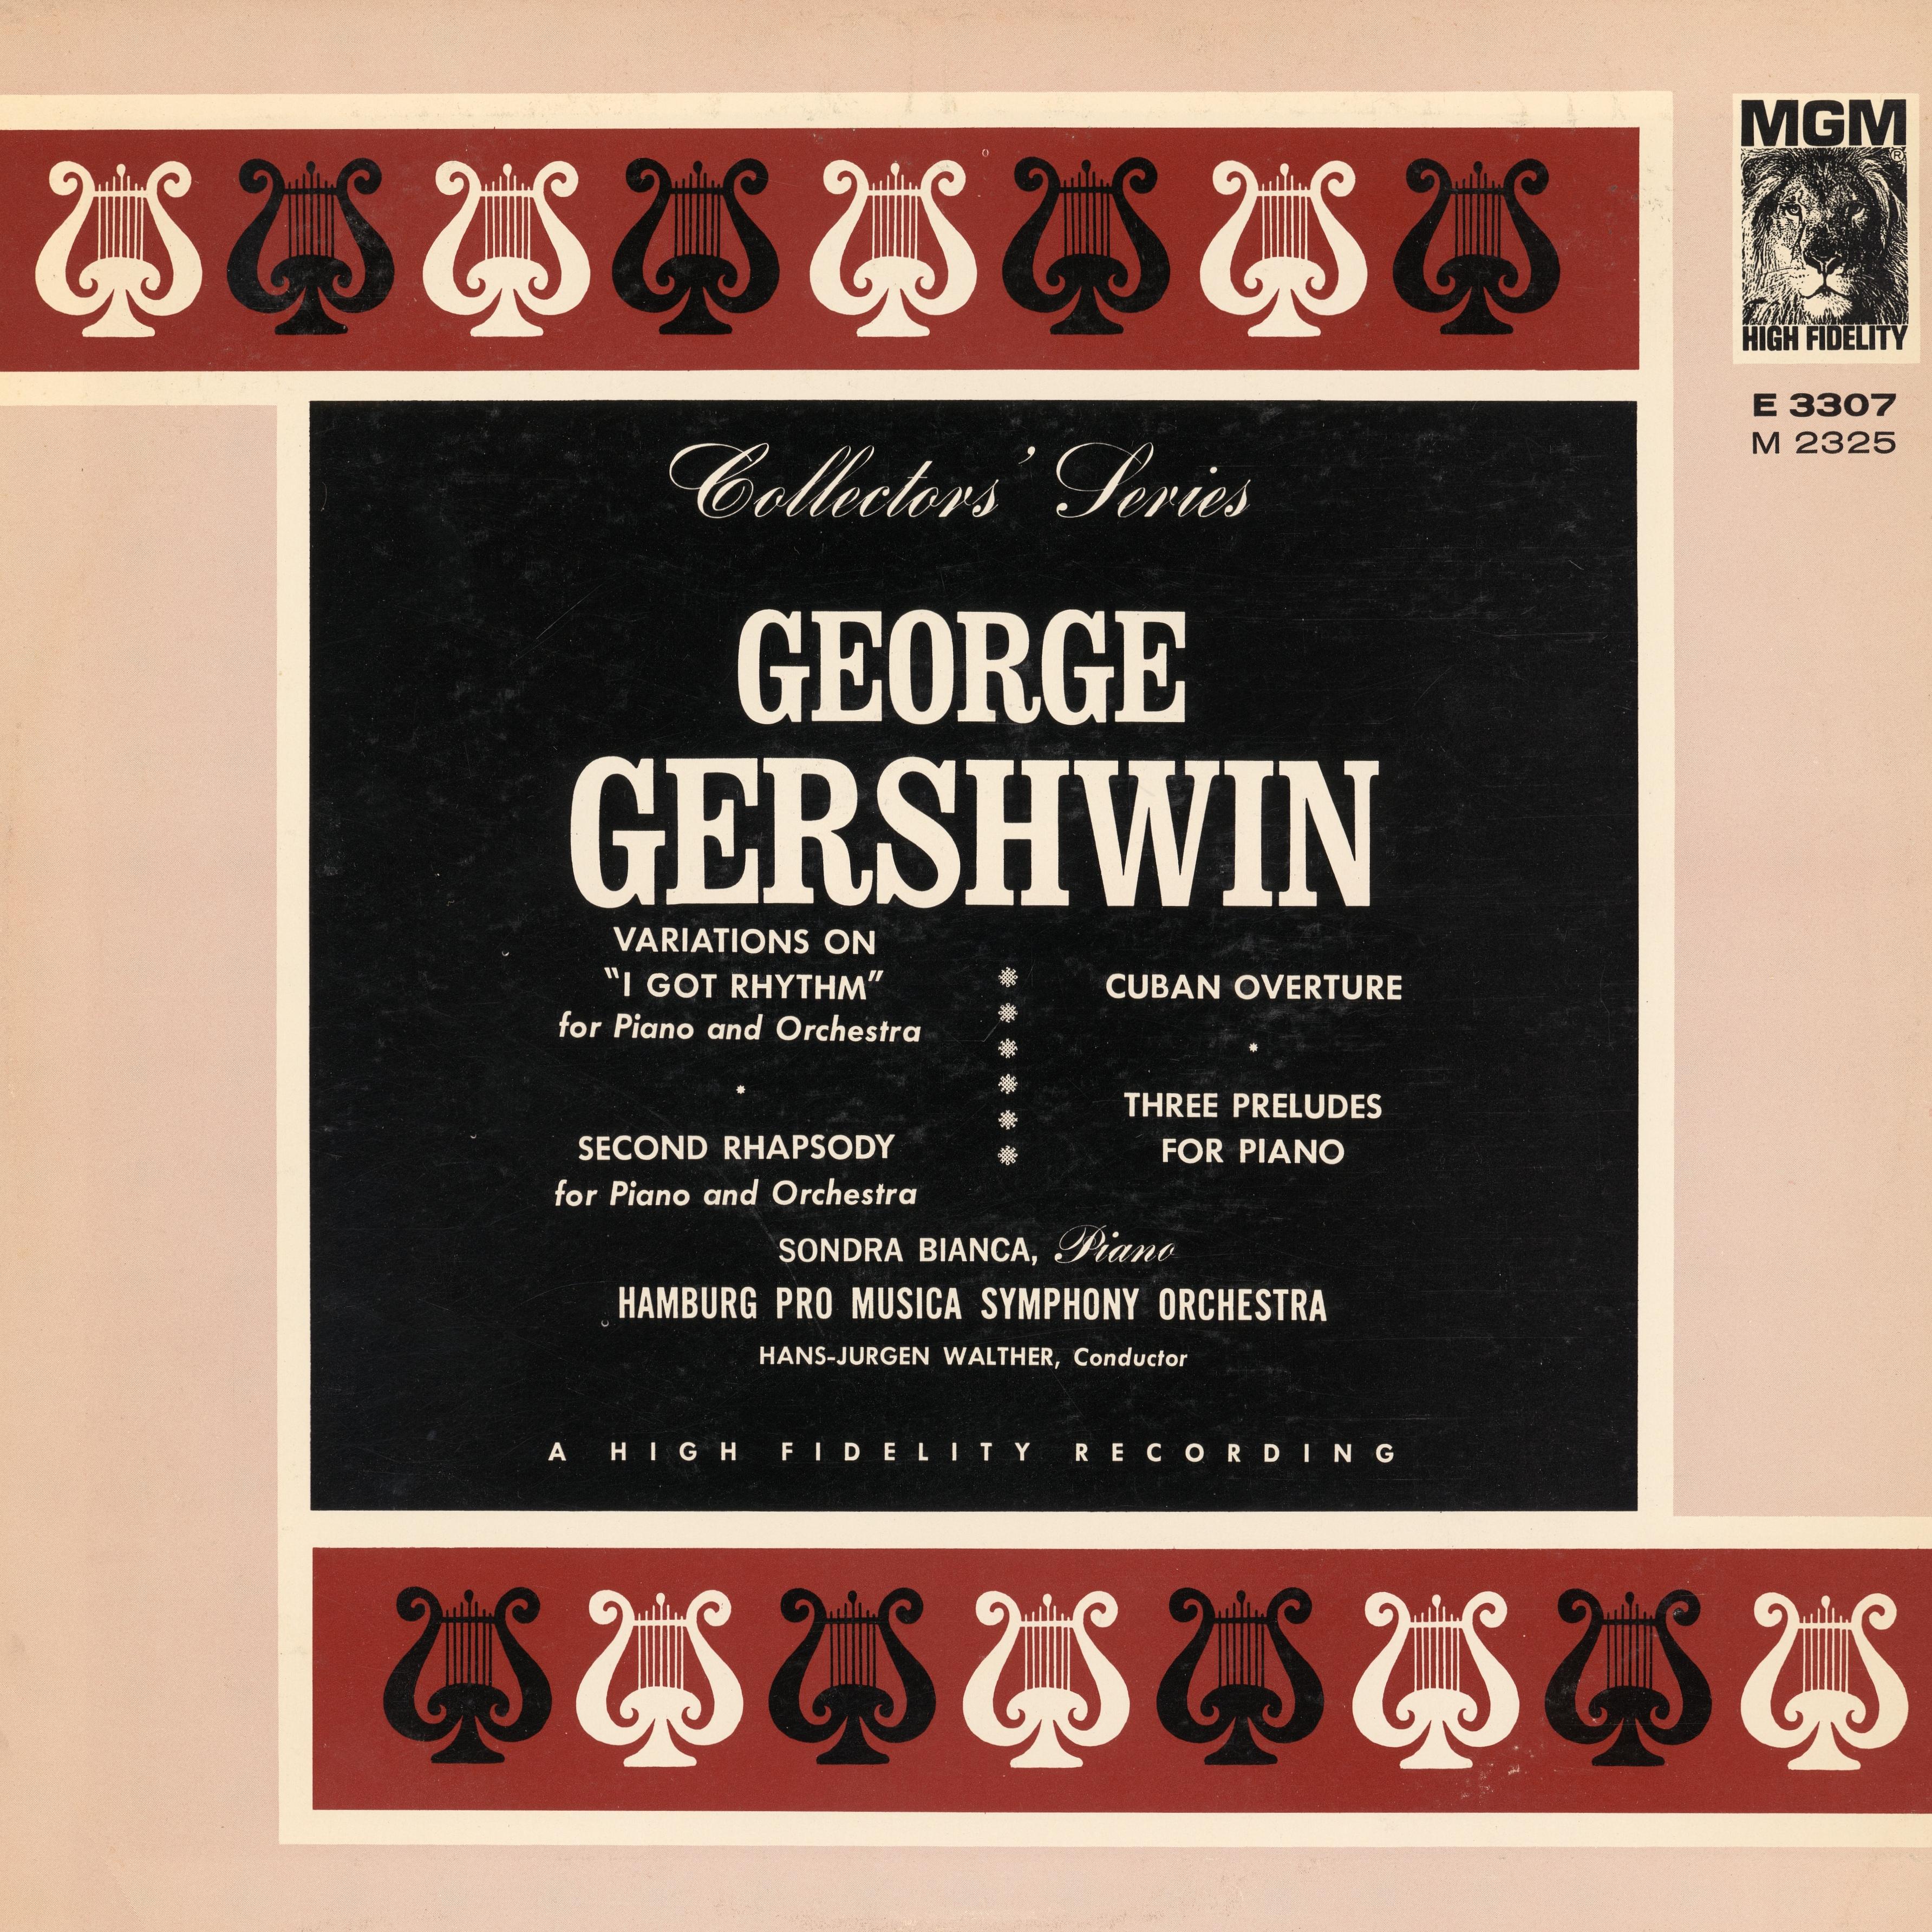 Recto de la pochette du disque Metro Goldwyn Mayer MGM 3307